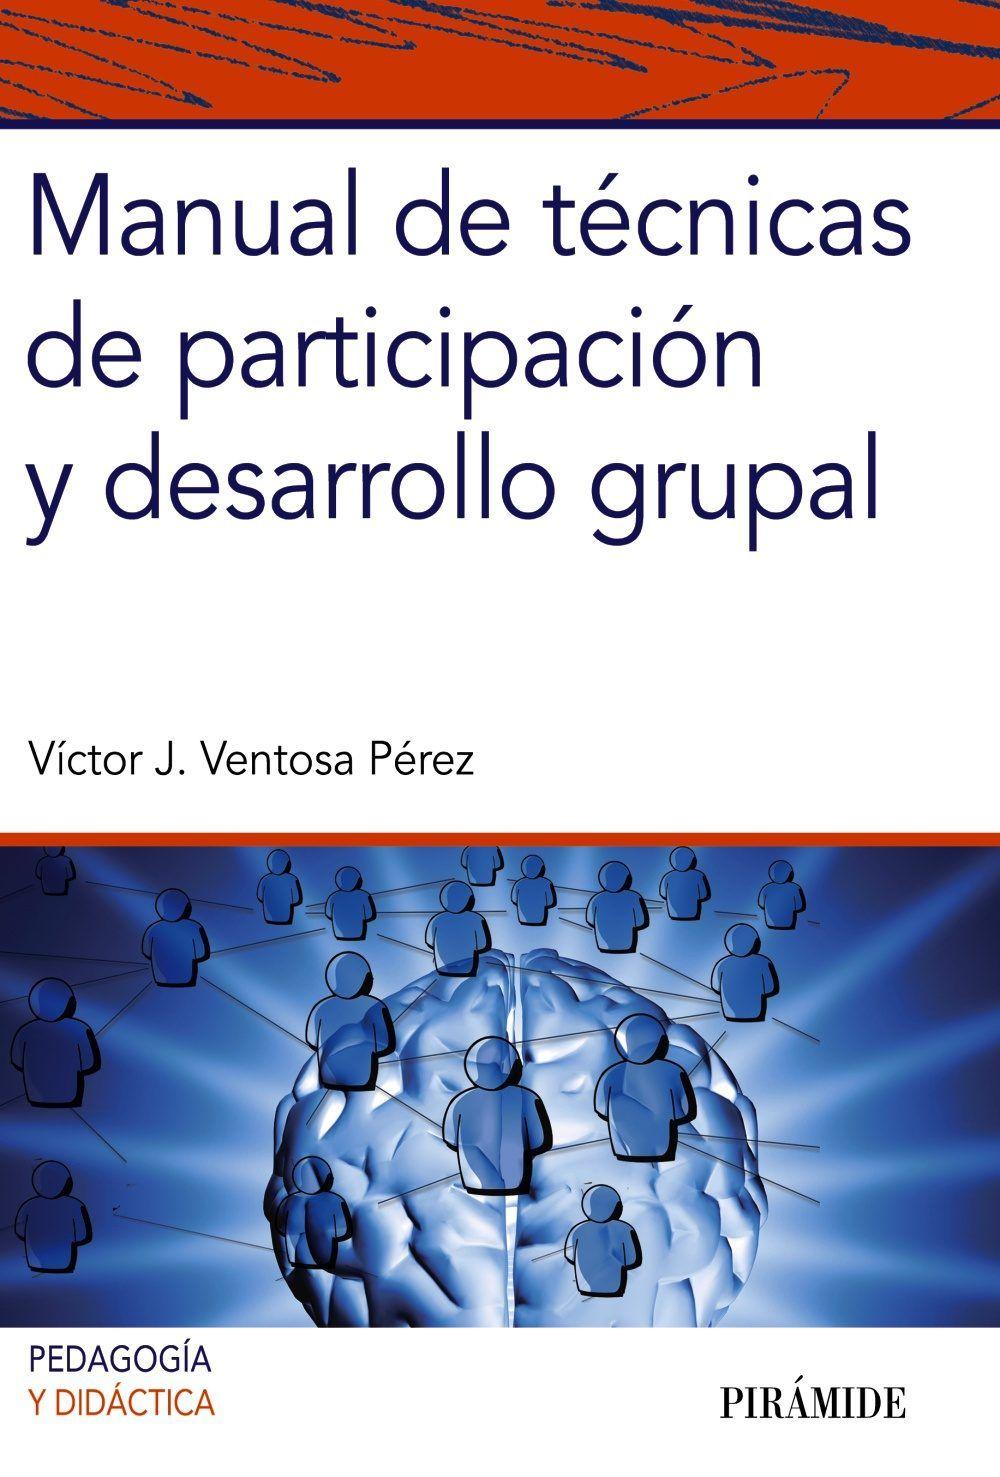 Manual De Técnicas De Participación Y Desarrollo Grupal Víctor Ventosa Pérez Cgi Pandora Screenshot